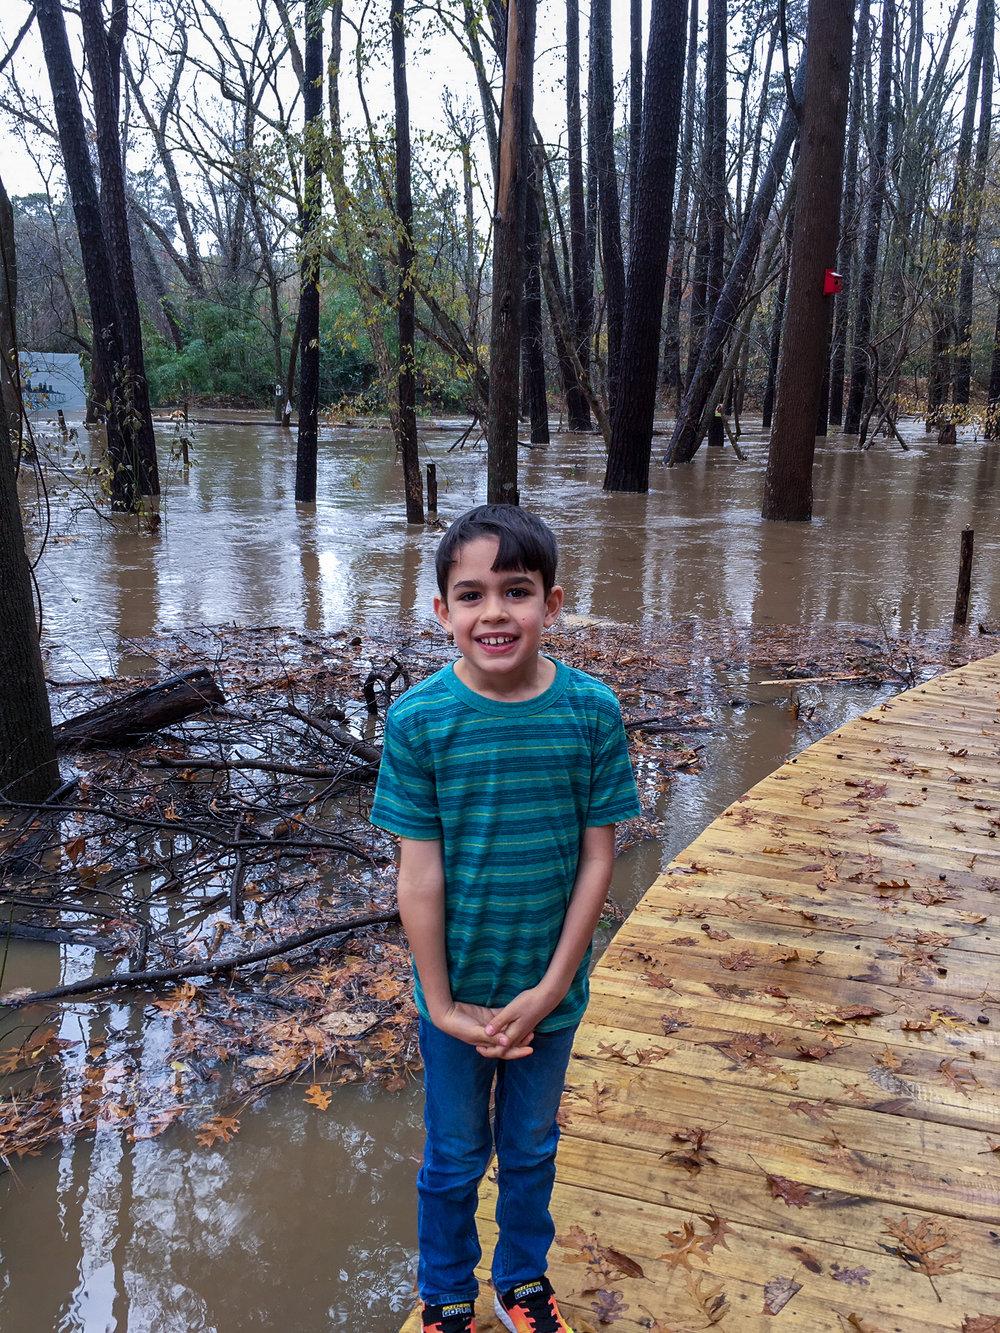 The Woodland Loop is a flood plain for Nancy Creek.